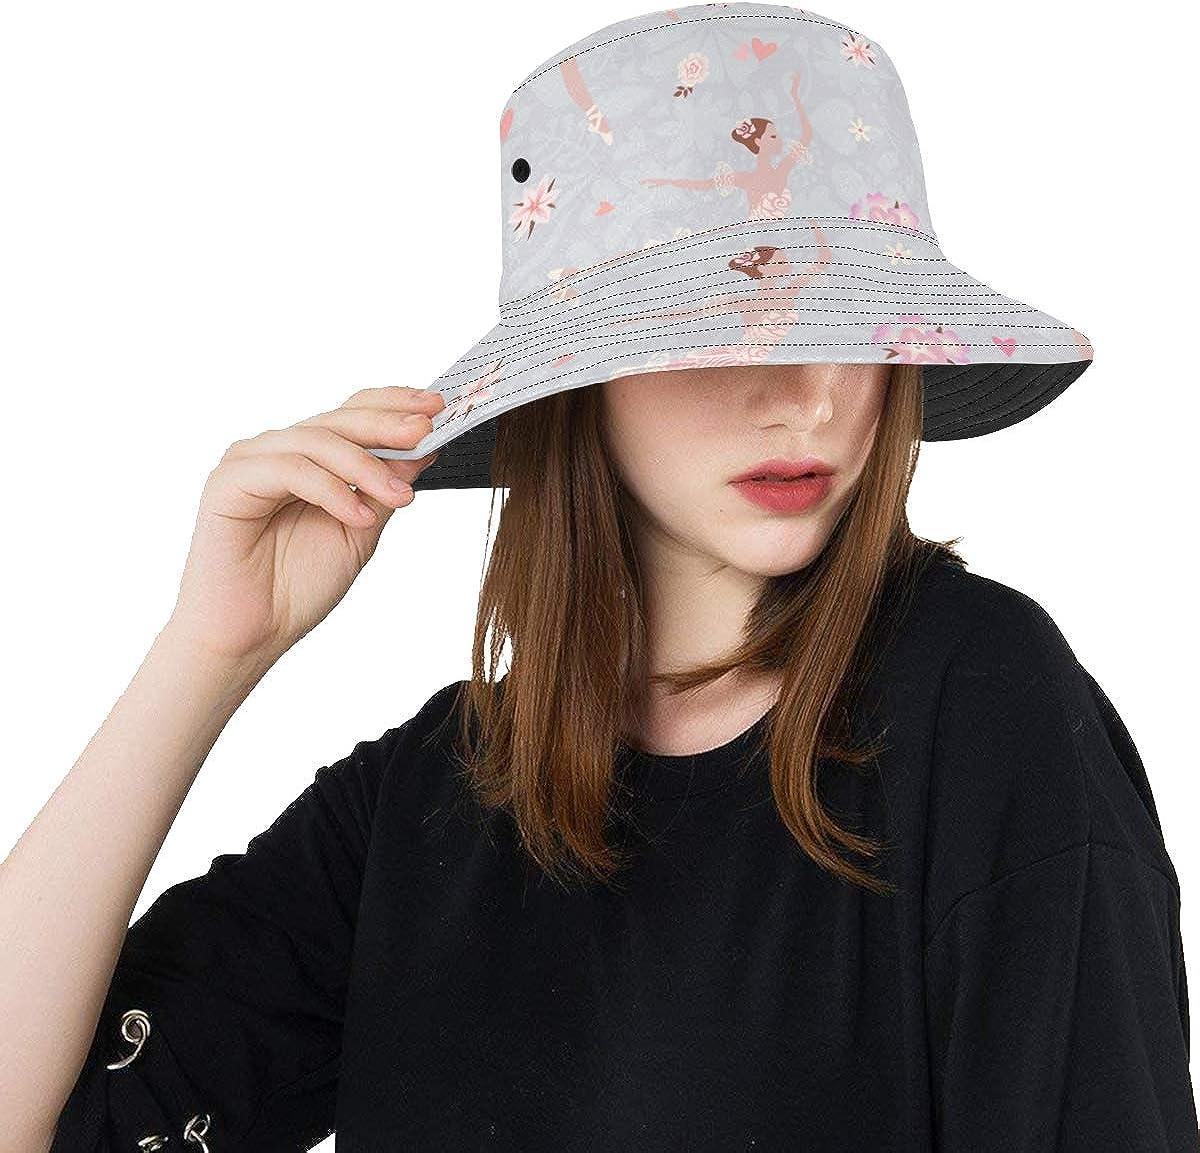 Ballet Ballerina Girl Summer Unisex Fishing Sun Top Bucket Hats for Kid Teens Women and Men with Packable Fisherman Cap for Outdoor Baseball Sport Picnic